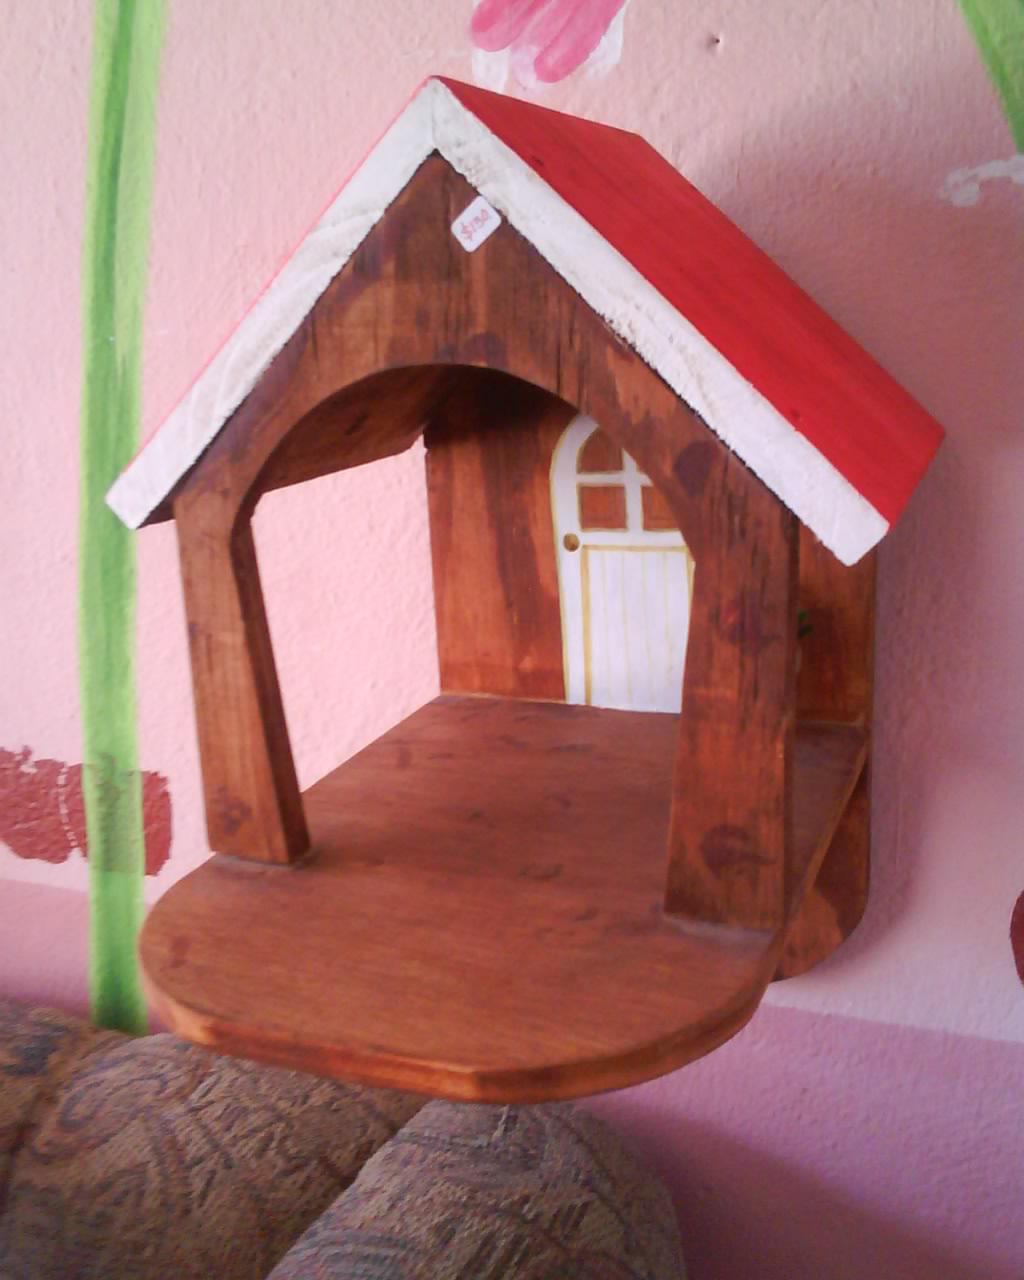 Manos creativas casita para aves - Casita para pajaros ...